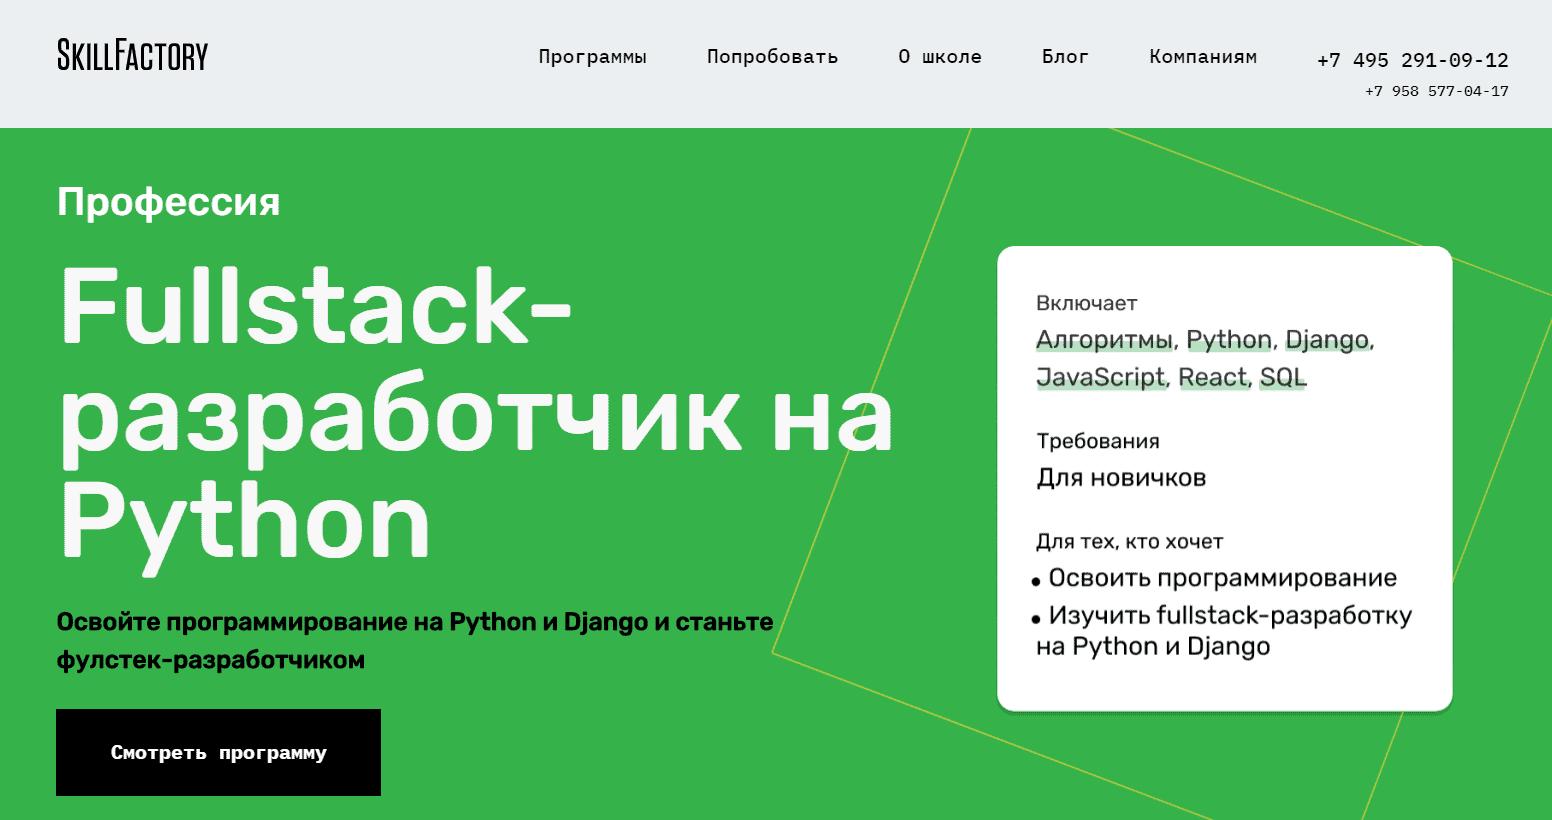 Онлайн-курс Профессия Fullstack-разработчик на Python